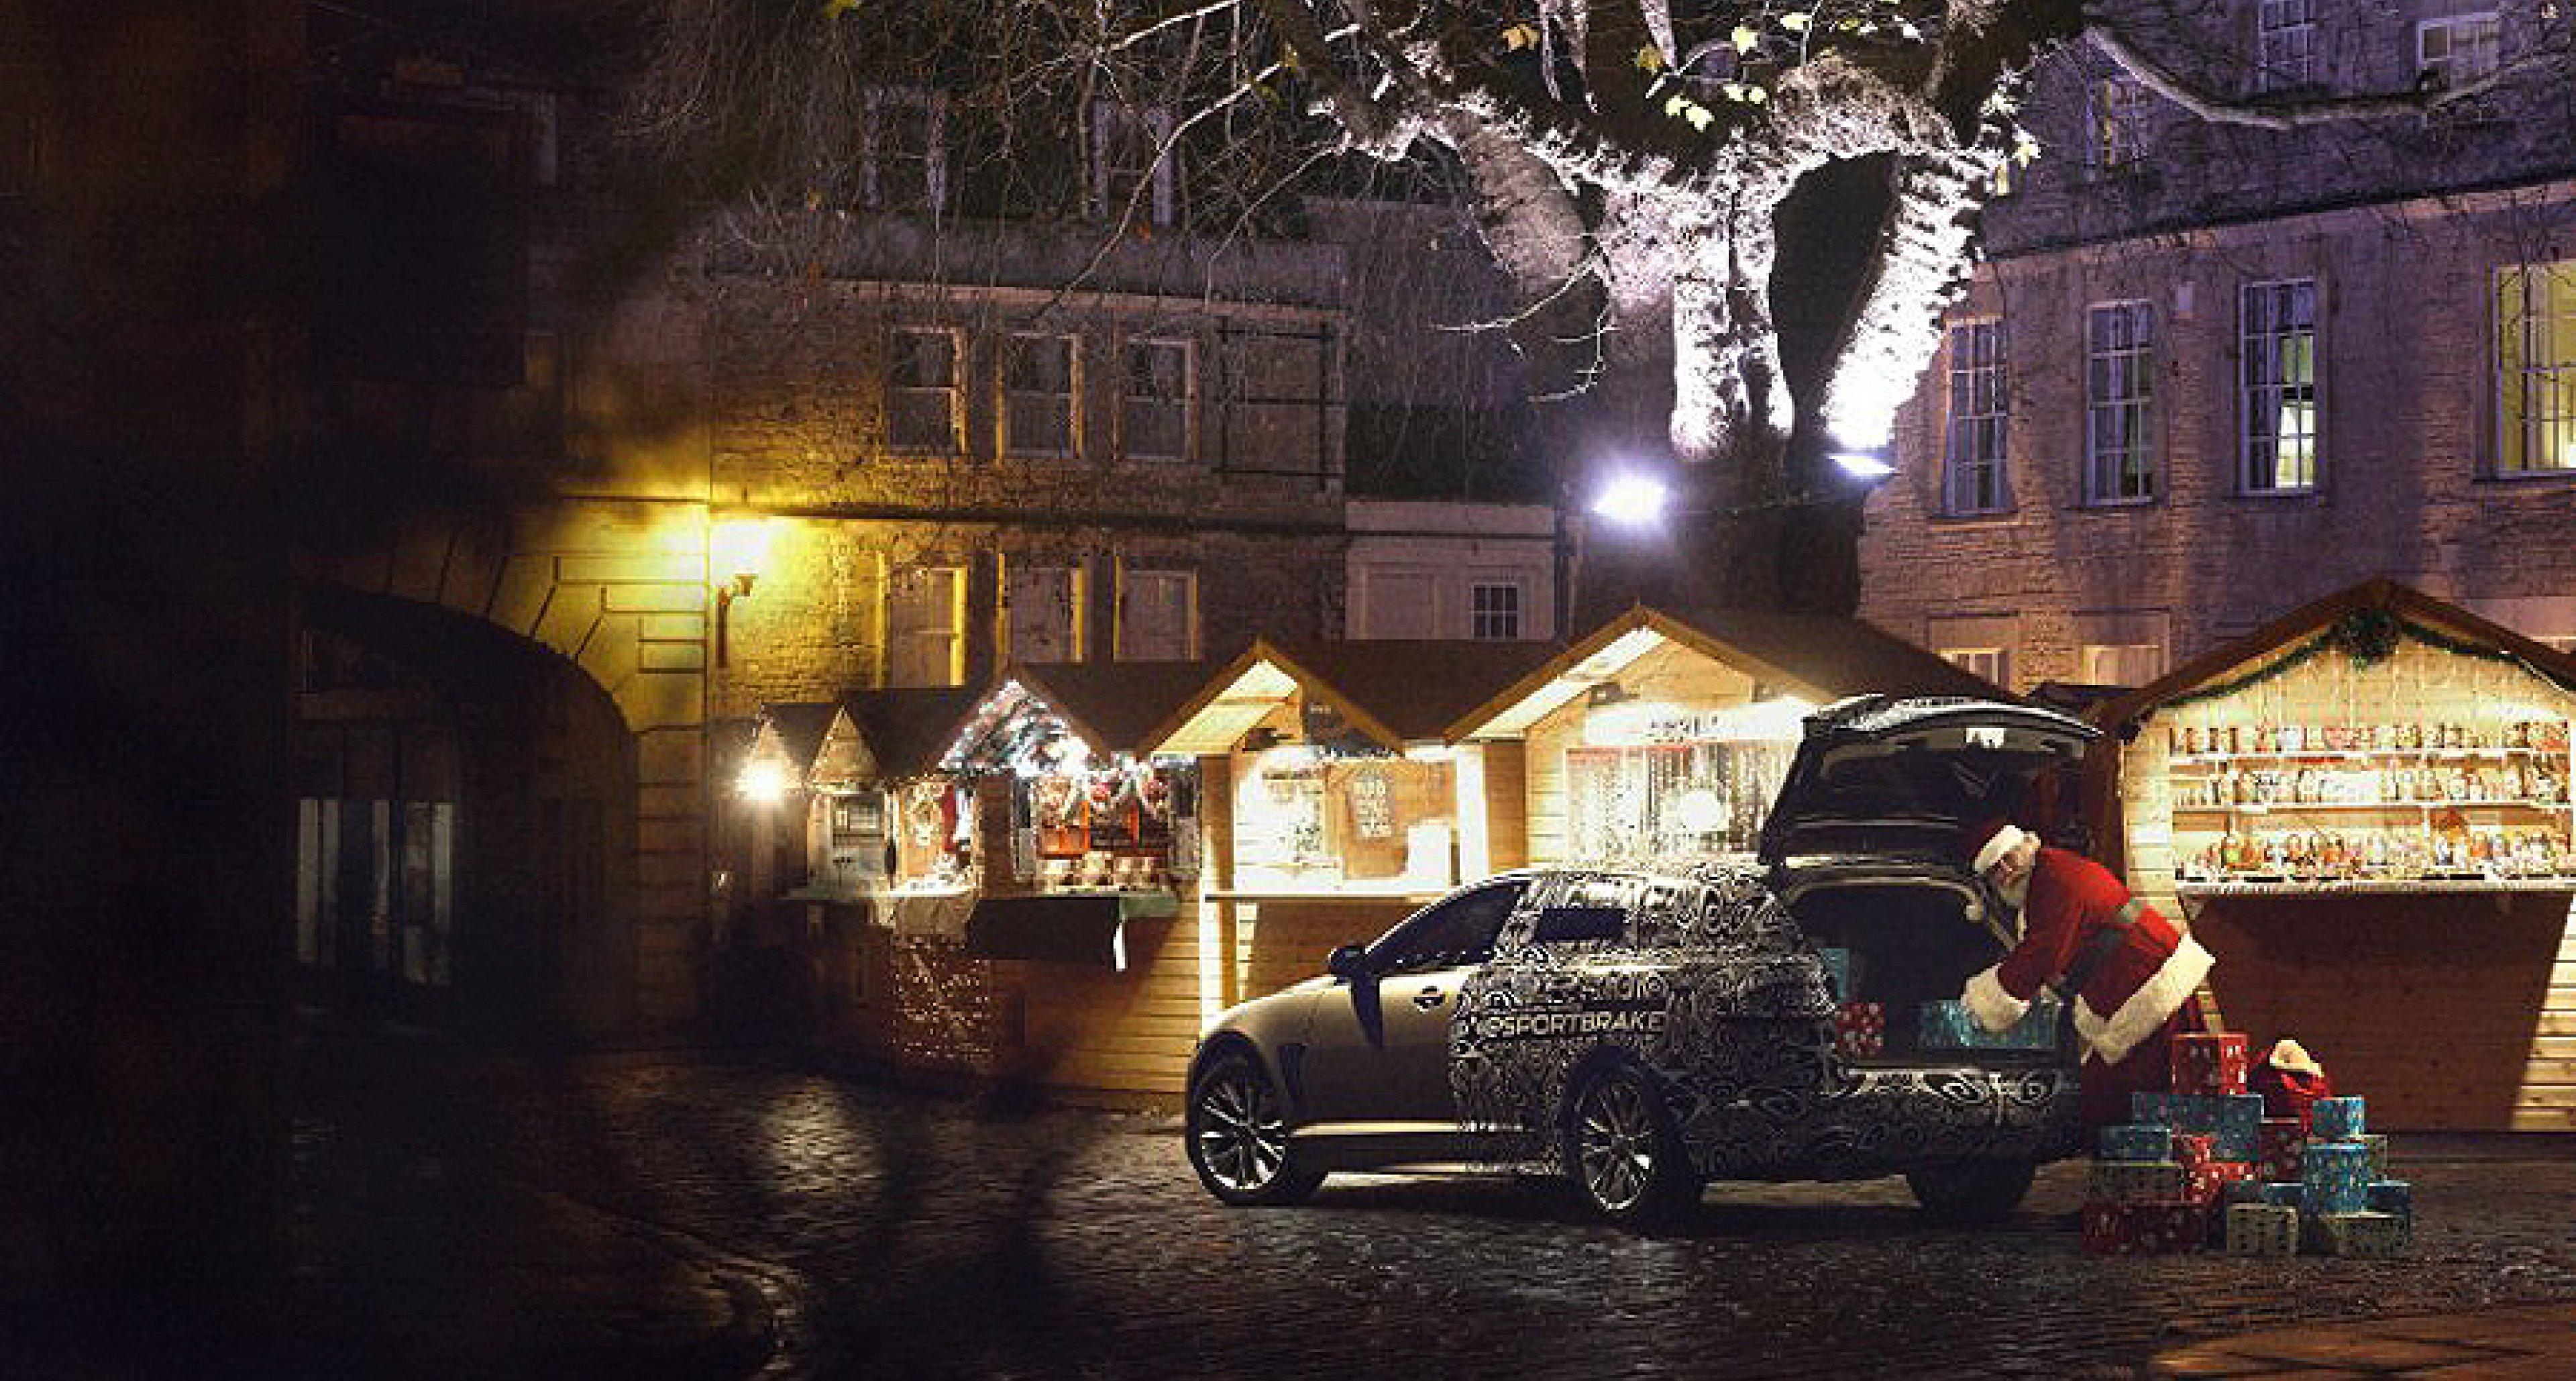 Santa C. testet den neuen Jaguar XF Sportbrake